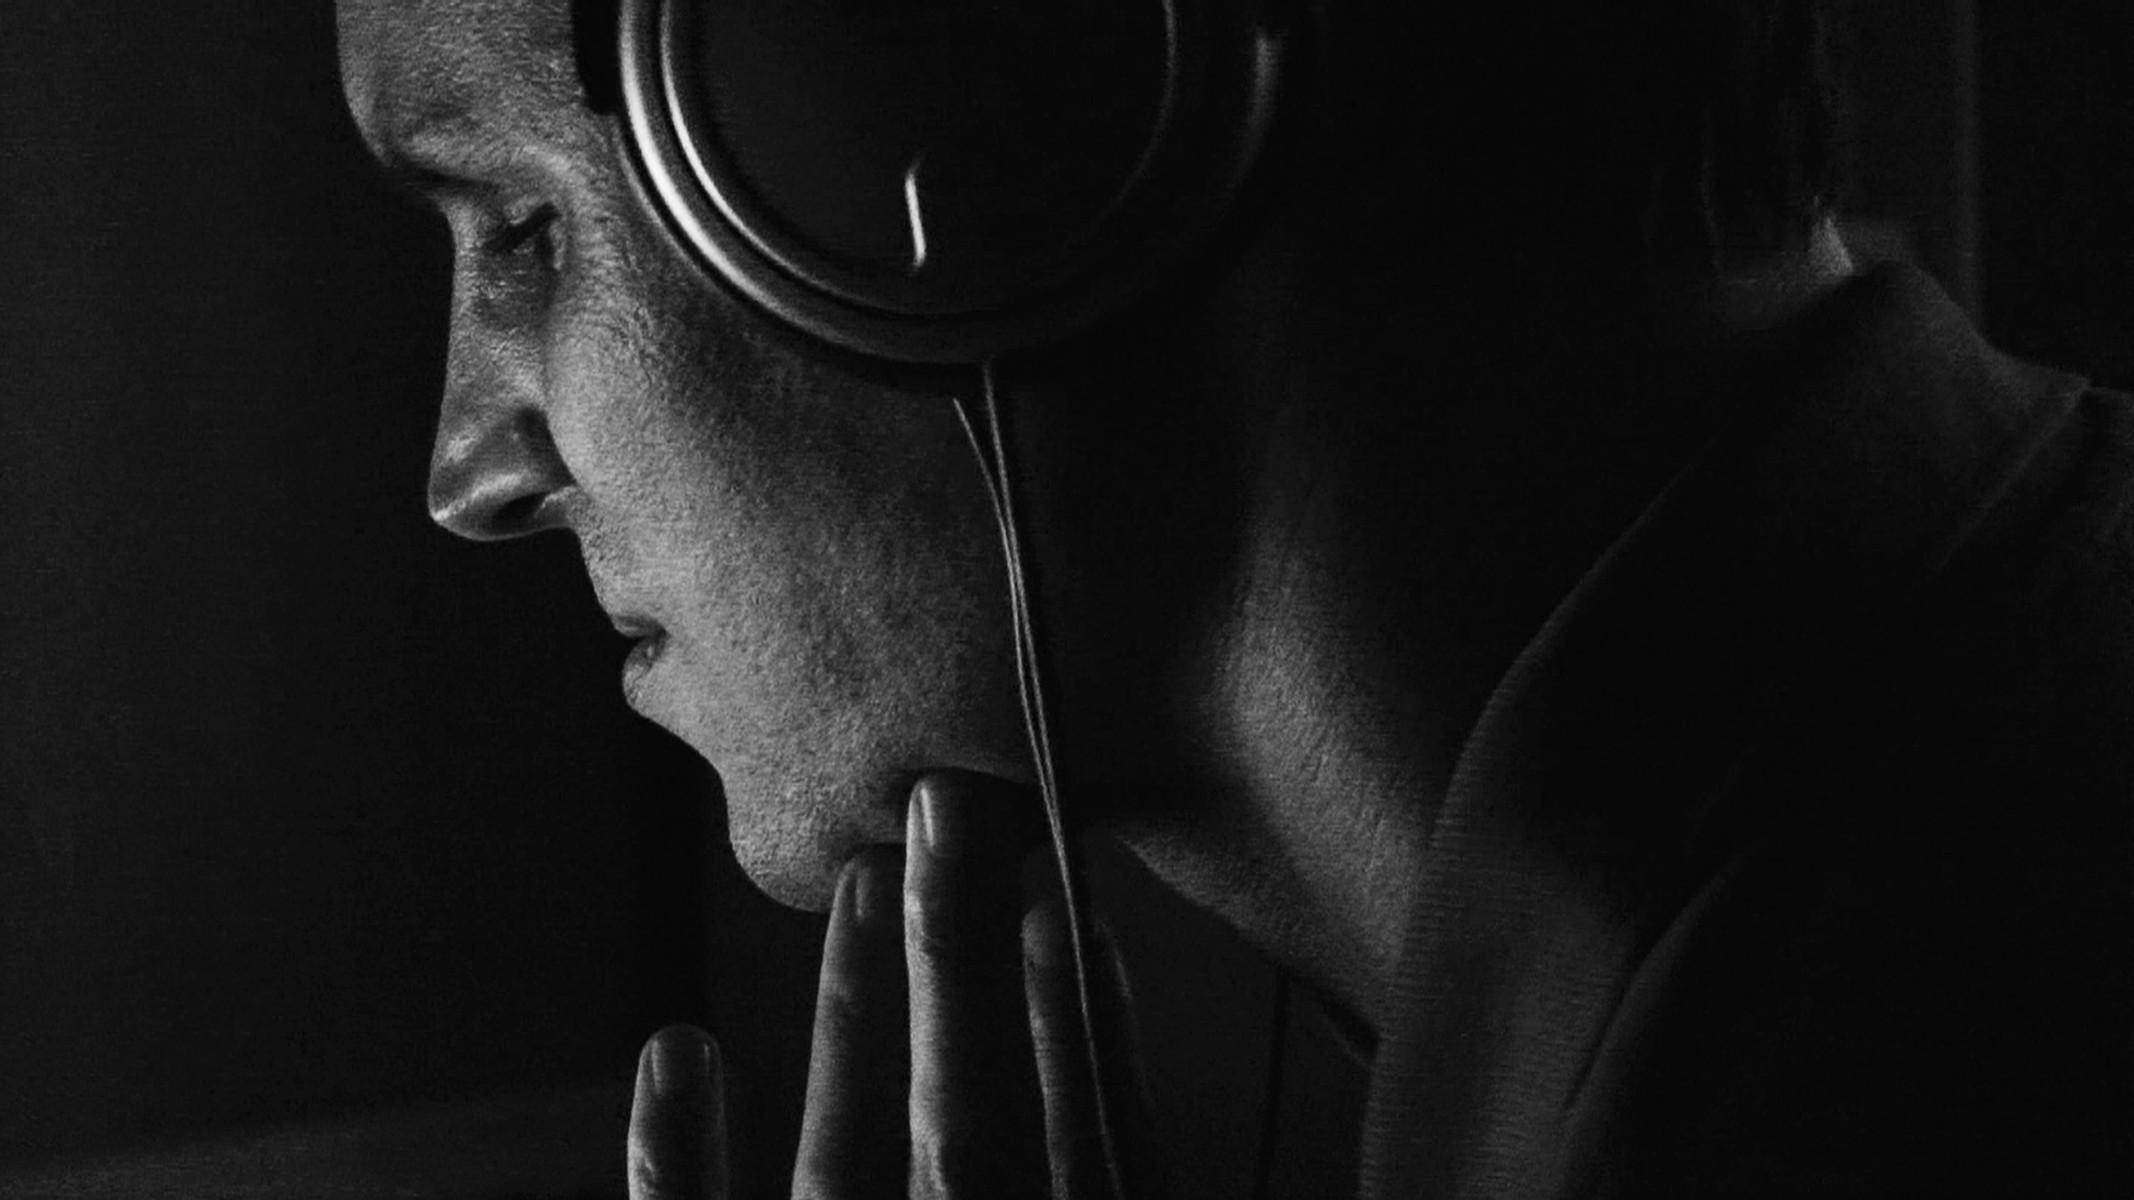 Imogen Stidworthy: Sacha (Listening), 2011–12. HD video with 3-channel soundtrack, 6' | video still